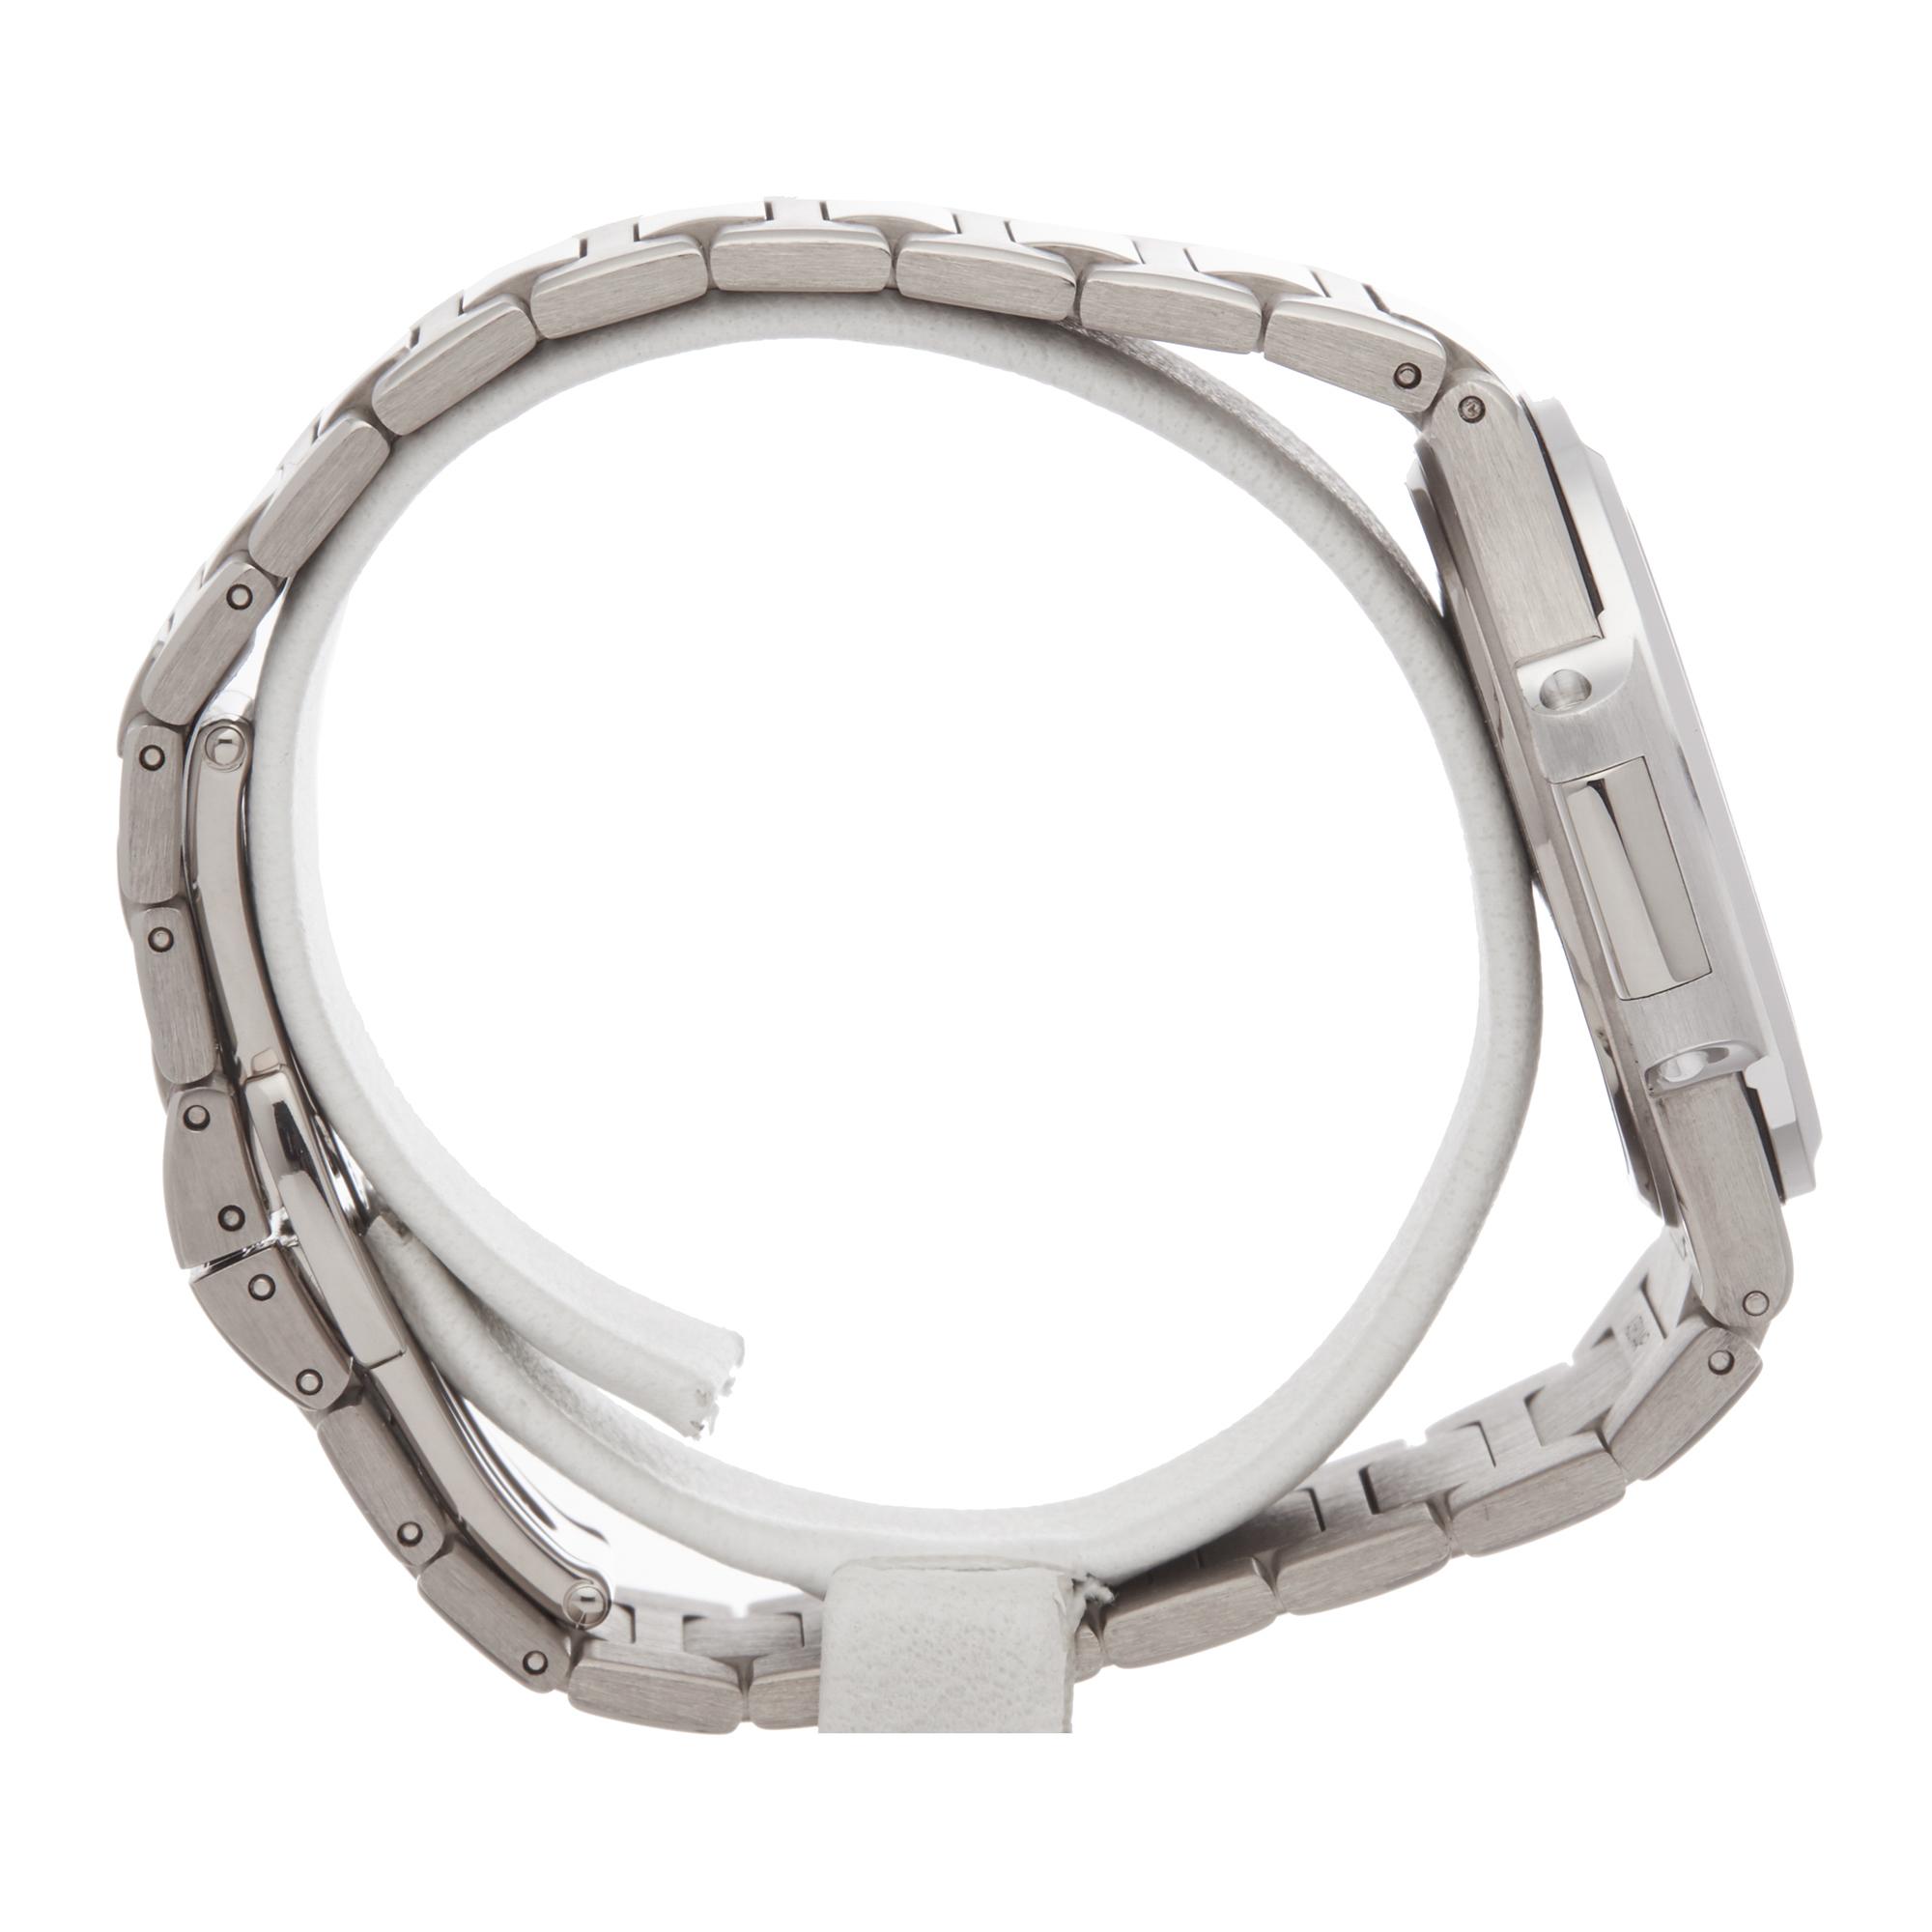 Patek Philippe Nautilus 7010G Ladies White Gold Diamond Watch - Image 6 of 8